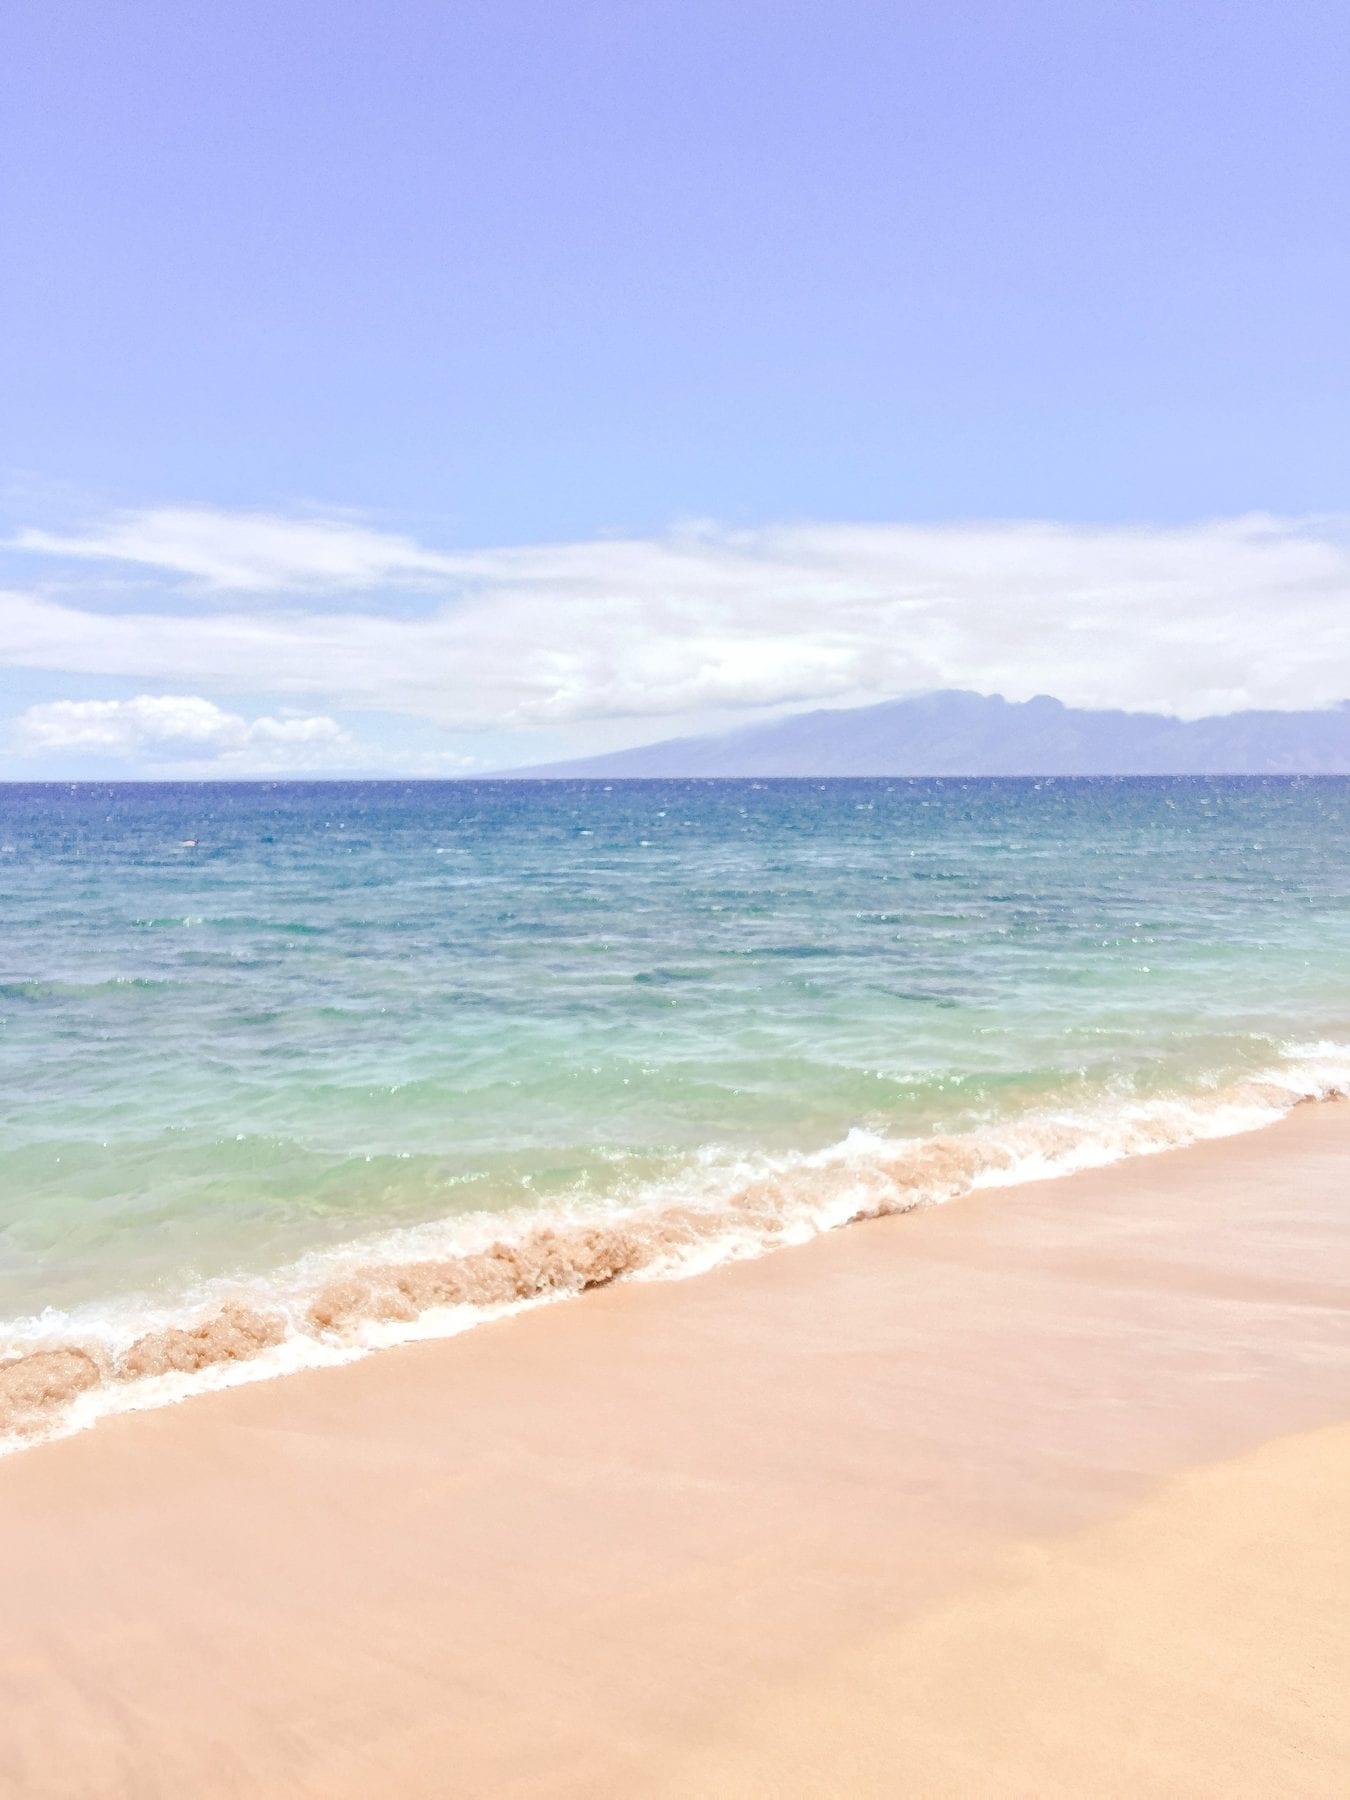 Hawaii Honeymoon Photos Megan & Justin Maui Vacation Things To Do iPhone-22.jpg